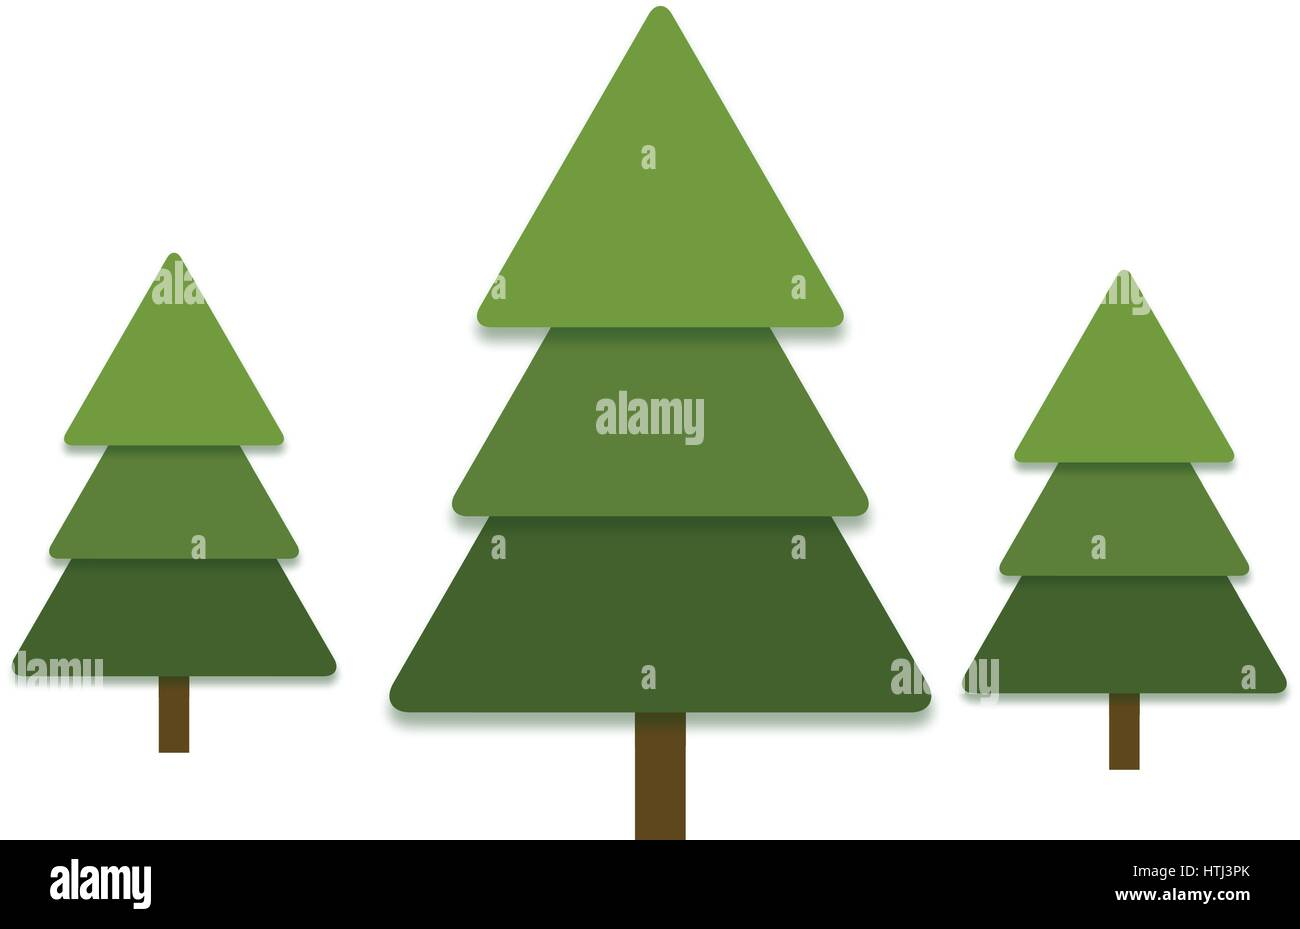 pine tree isolated icon vector stockfotos pine tree. Black Bedroom Furniture Sets. Home Design Ideas